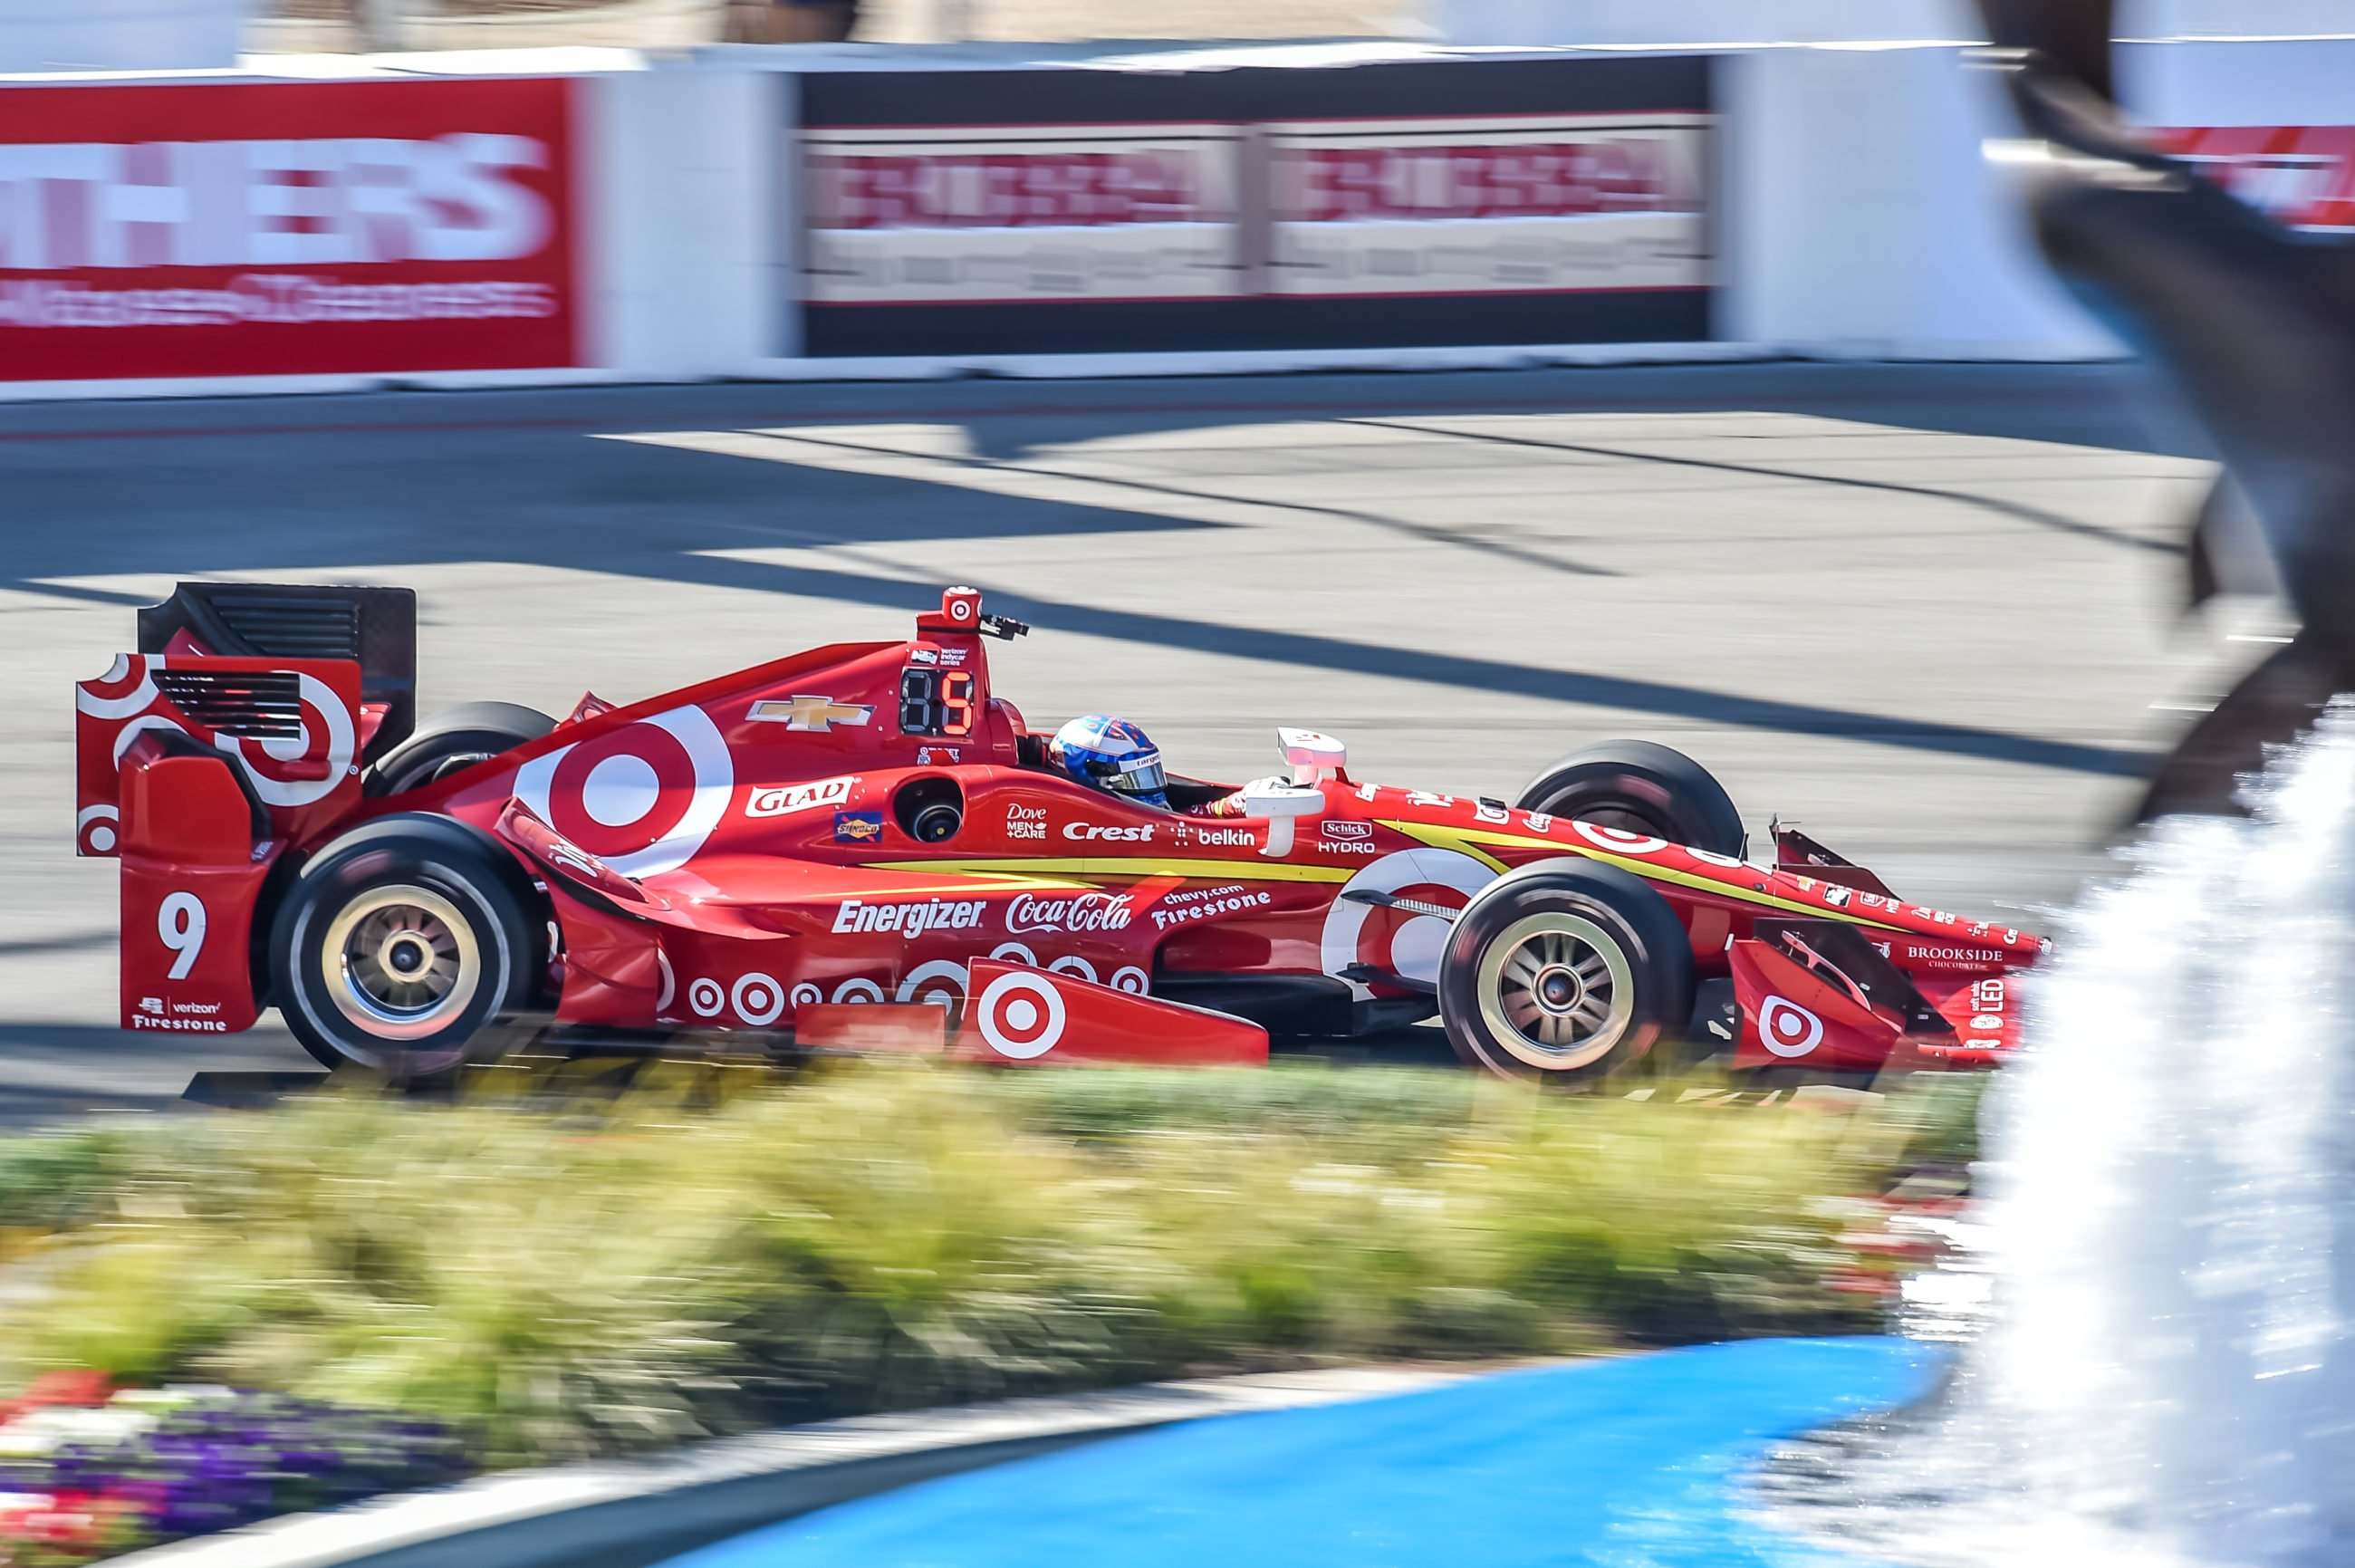 2017 Indycar TV Schedule - TV Network